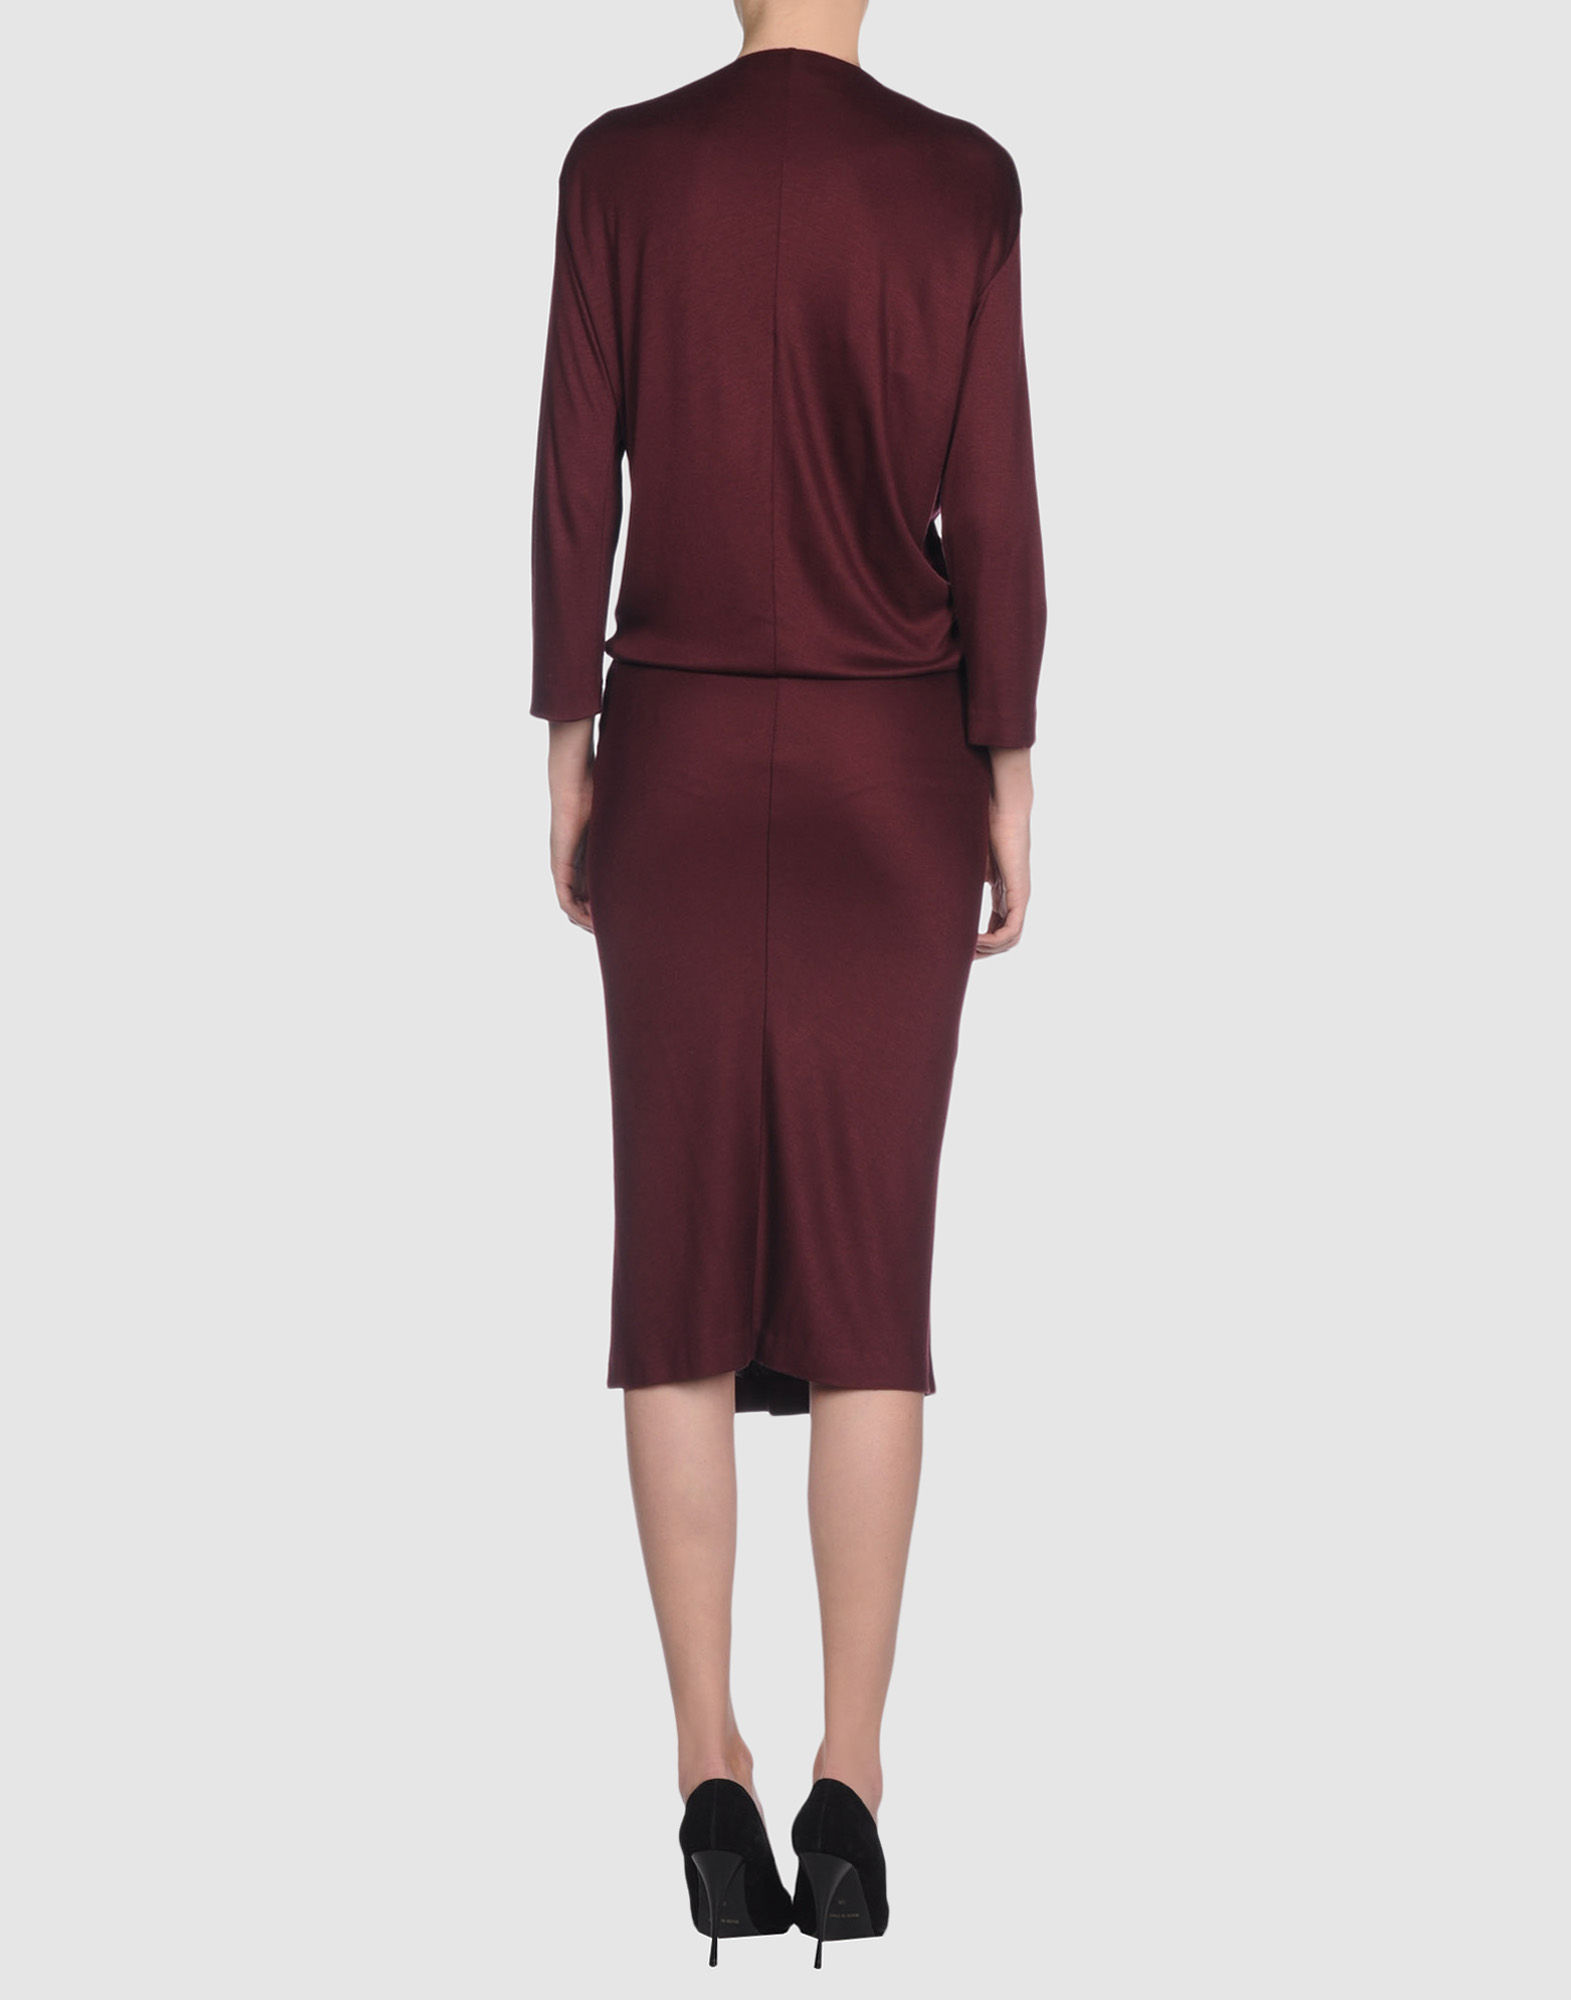 34209935IO 14 r - Βραδυνα Φορεματα Yves Saint Laurent Rive Gauche Κωδ.36